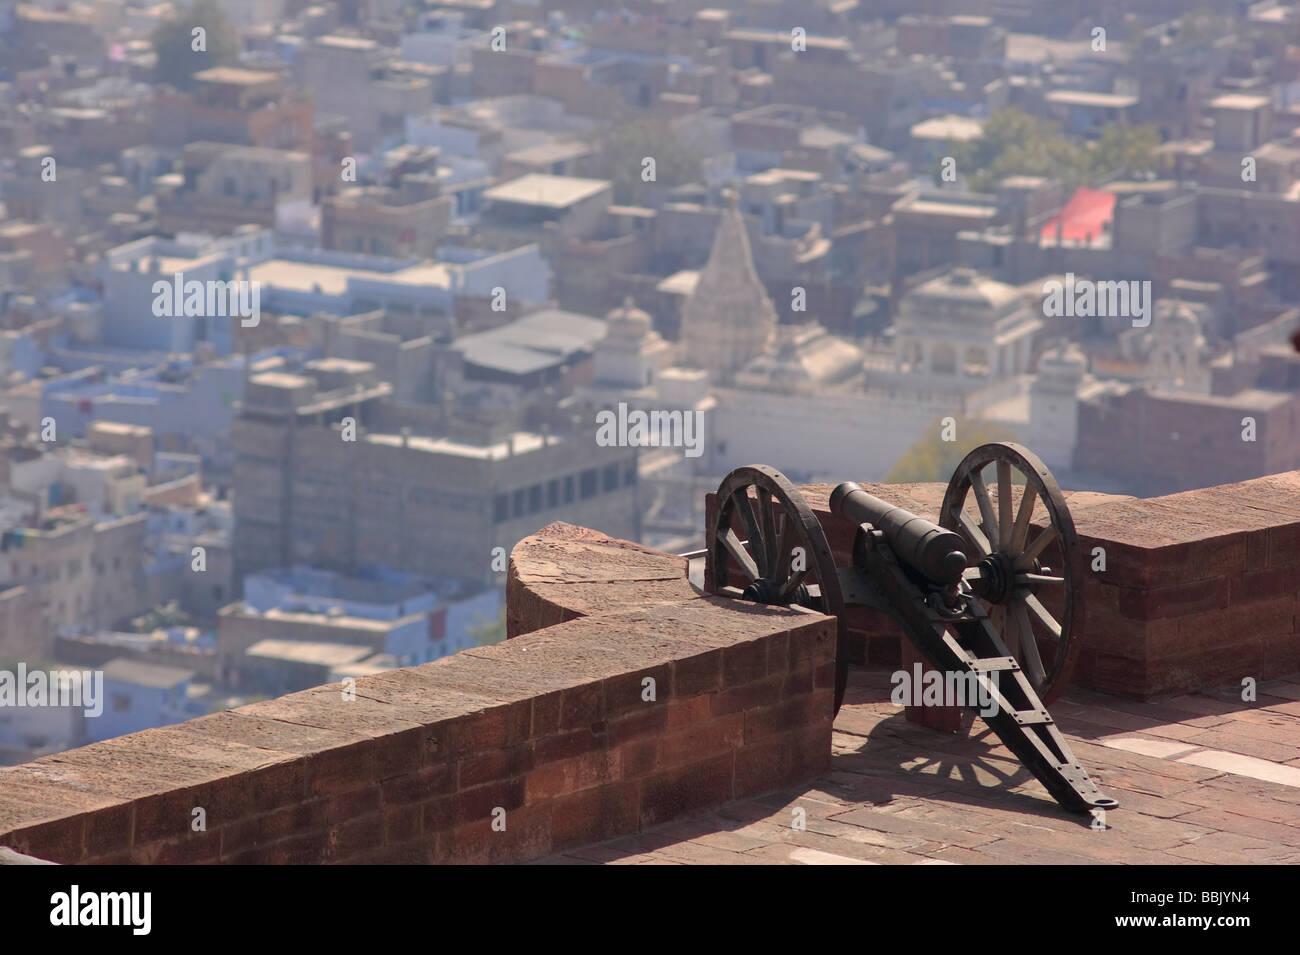 Cannon overlooking blue city skyline, Mehrangarh Fort, Jodhpur Rajasthan India. - Stock Image